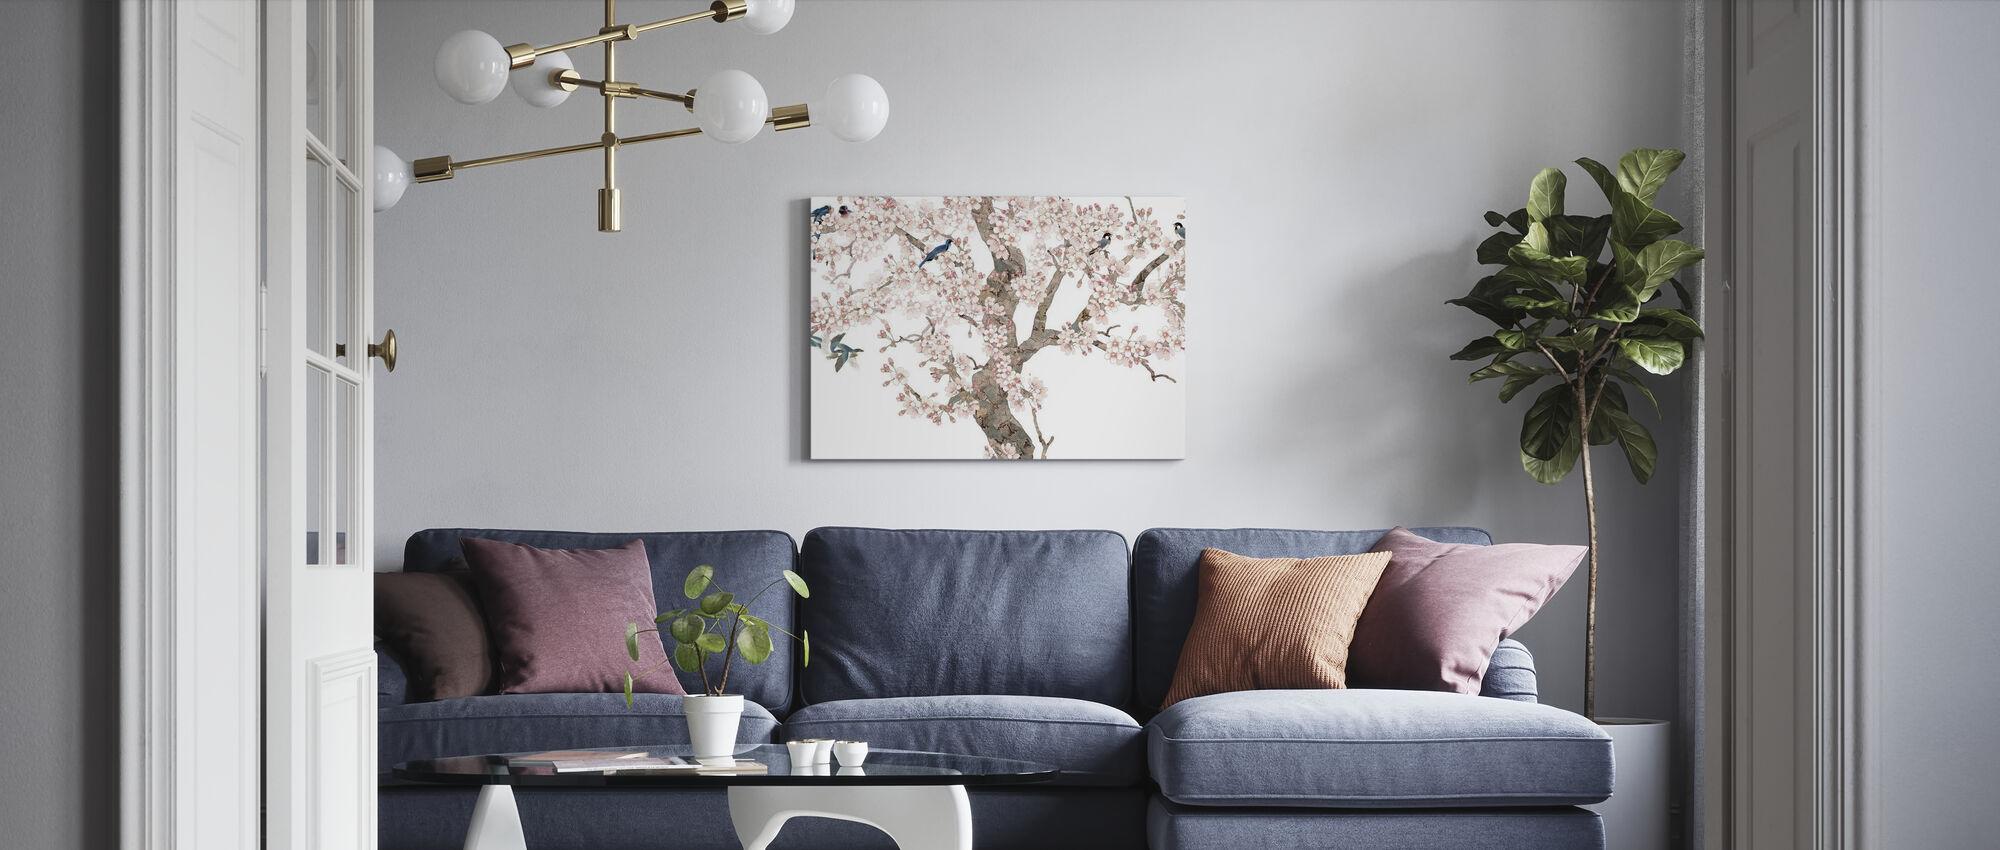 Doux Linnut koti - Canvastaulu - Olohuone